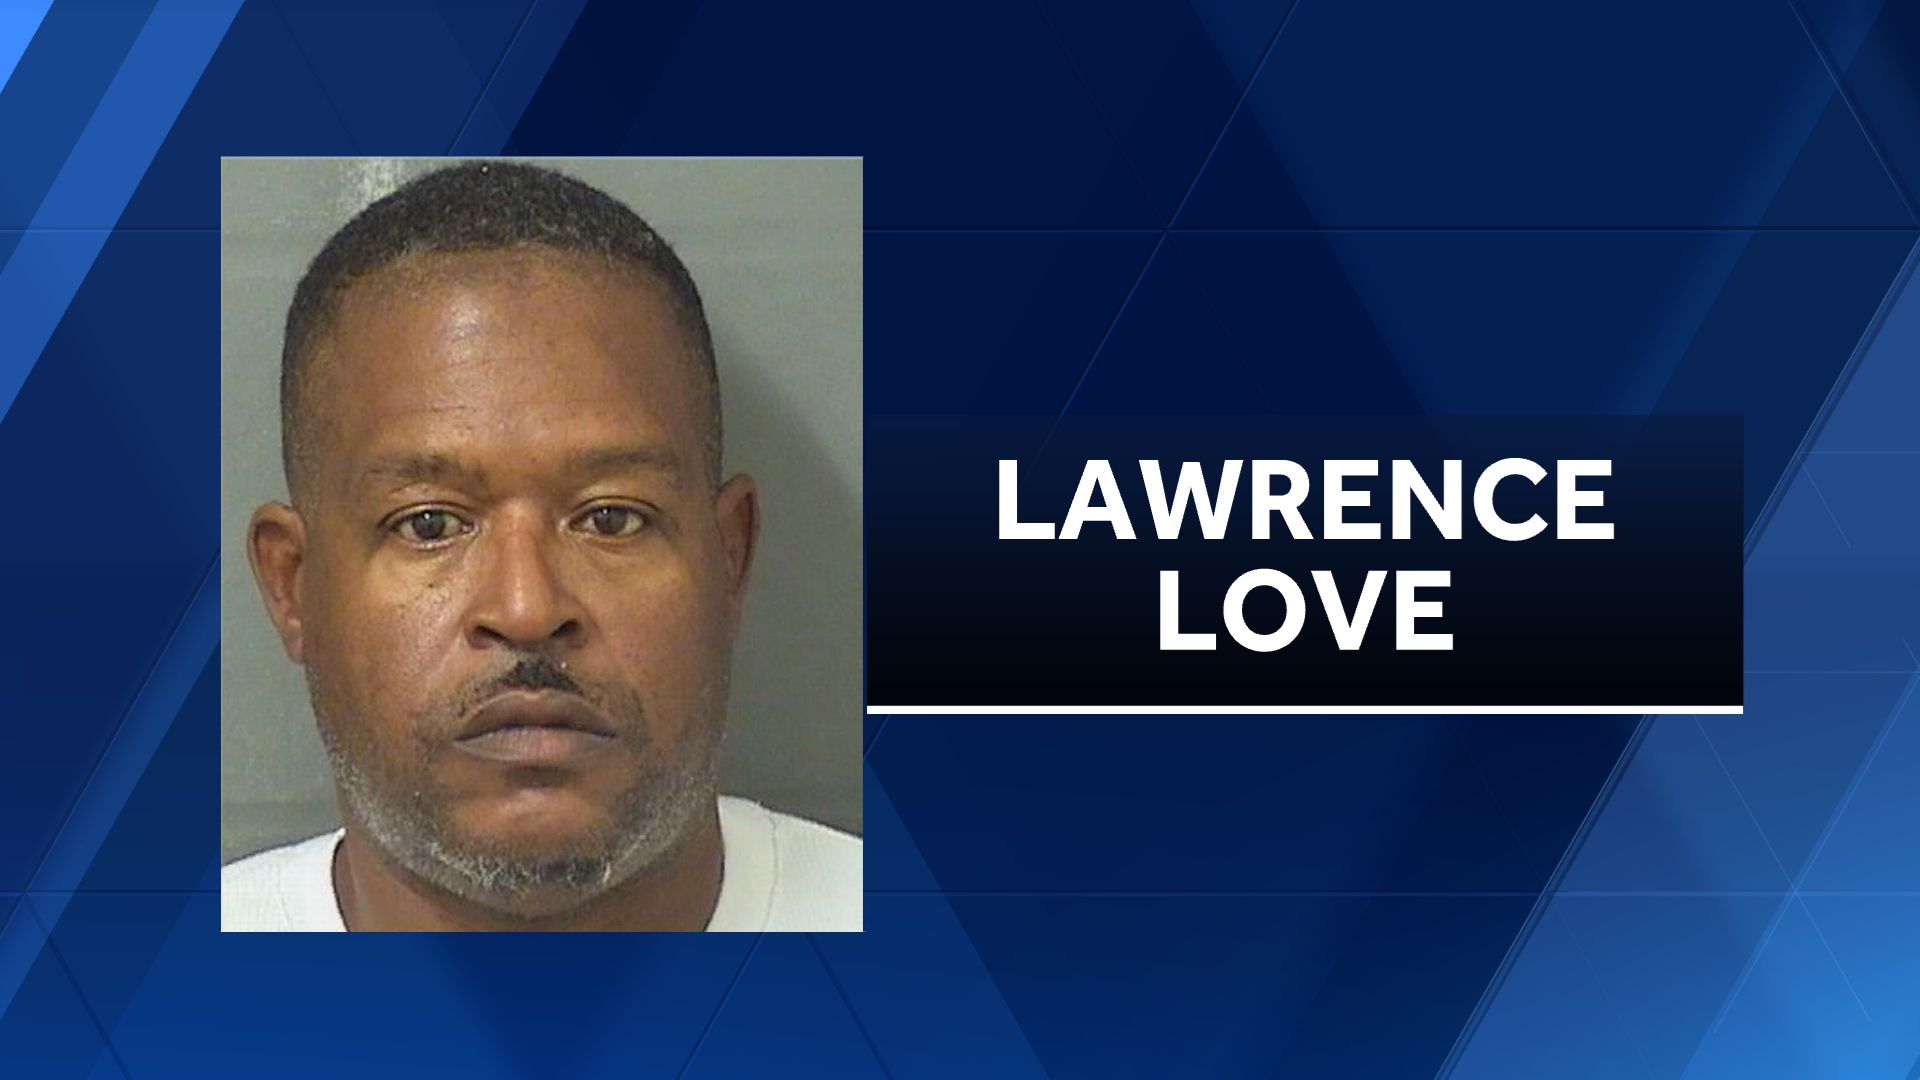 Arrest made in 1998 rape case